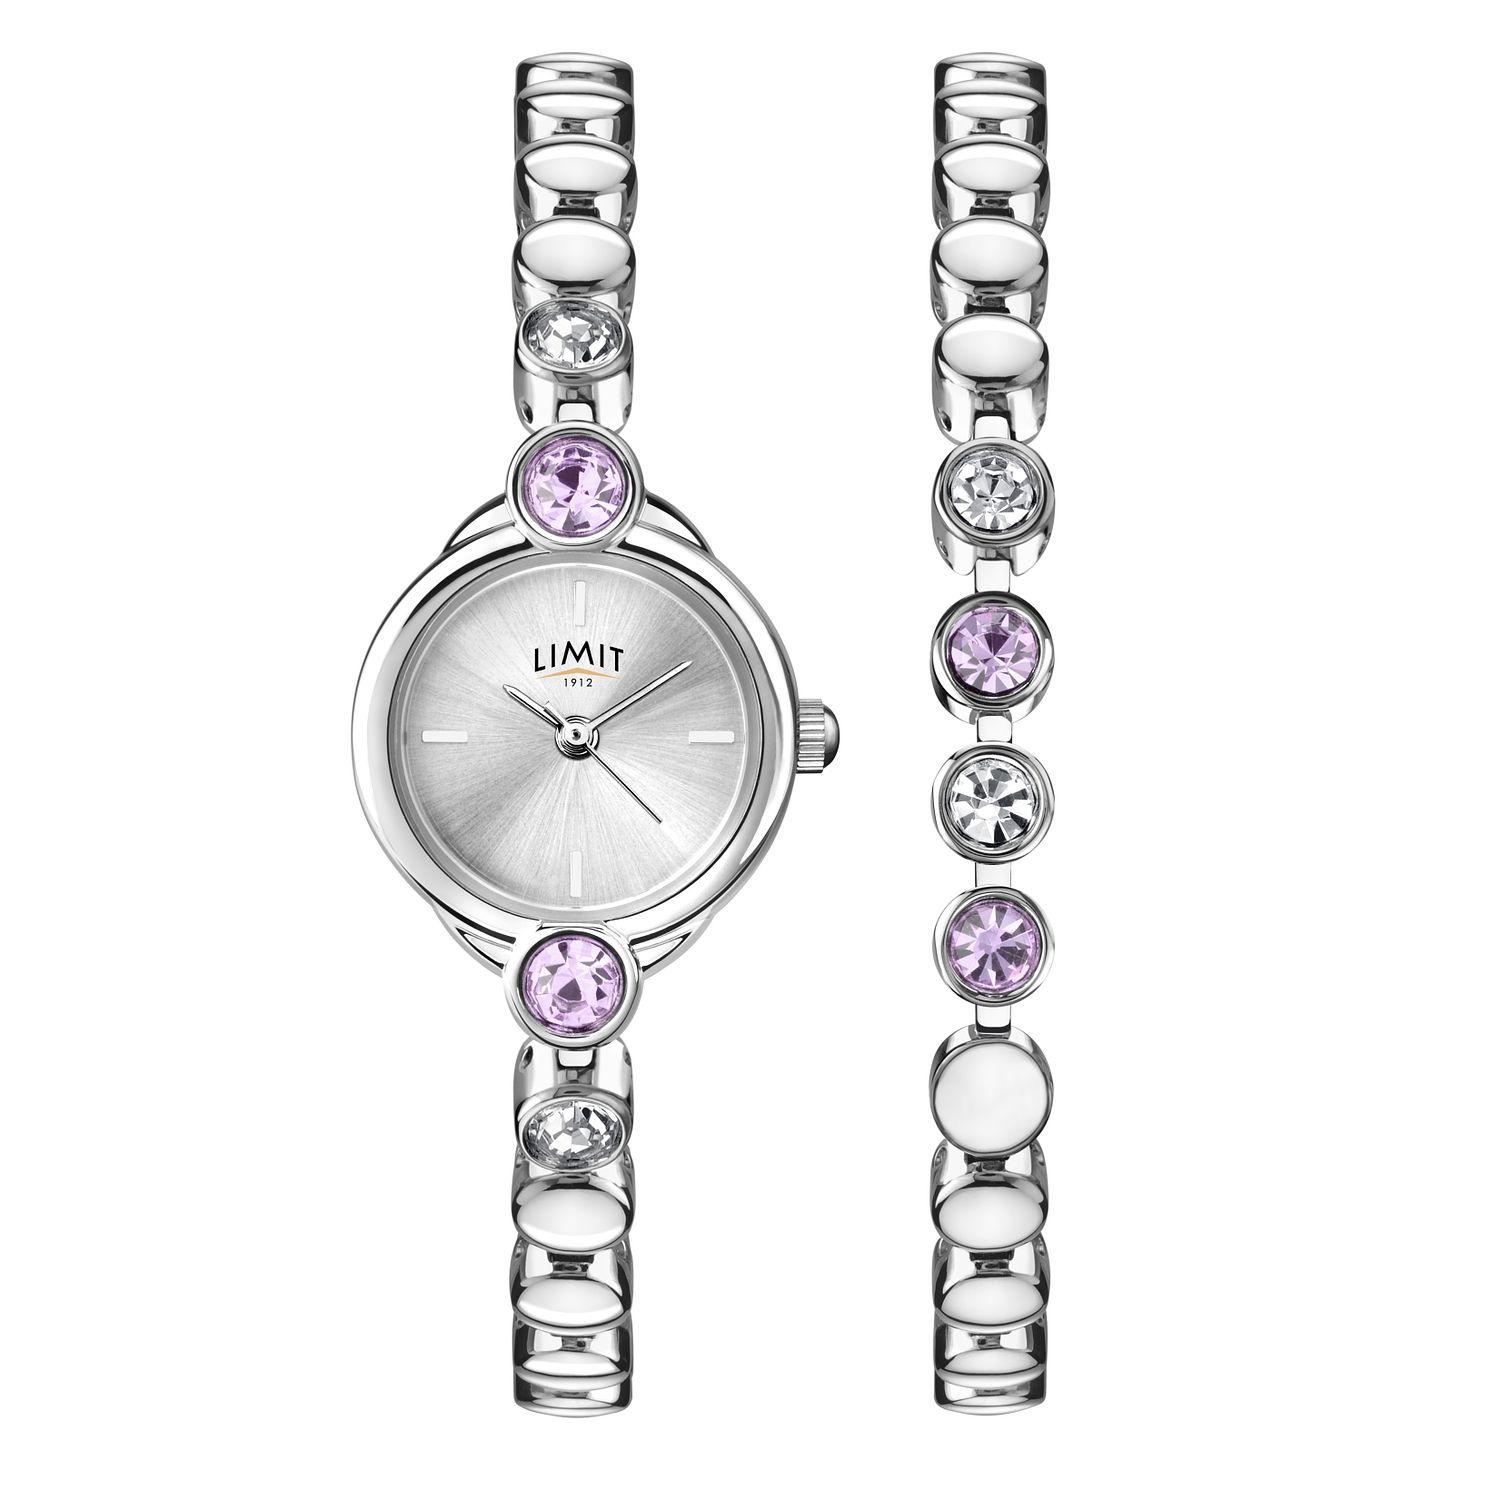 Limit Ladies' Watch & Bracelet Gift Set @ H. Samuel £18.99 (use code)